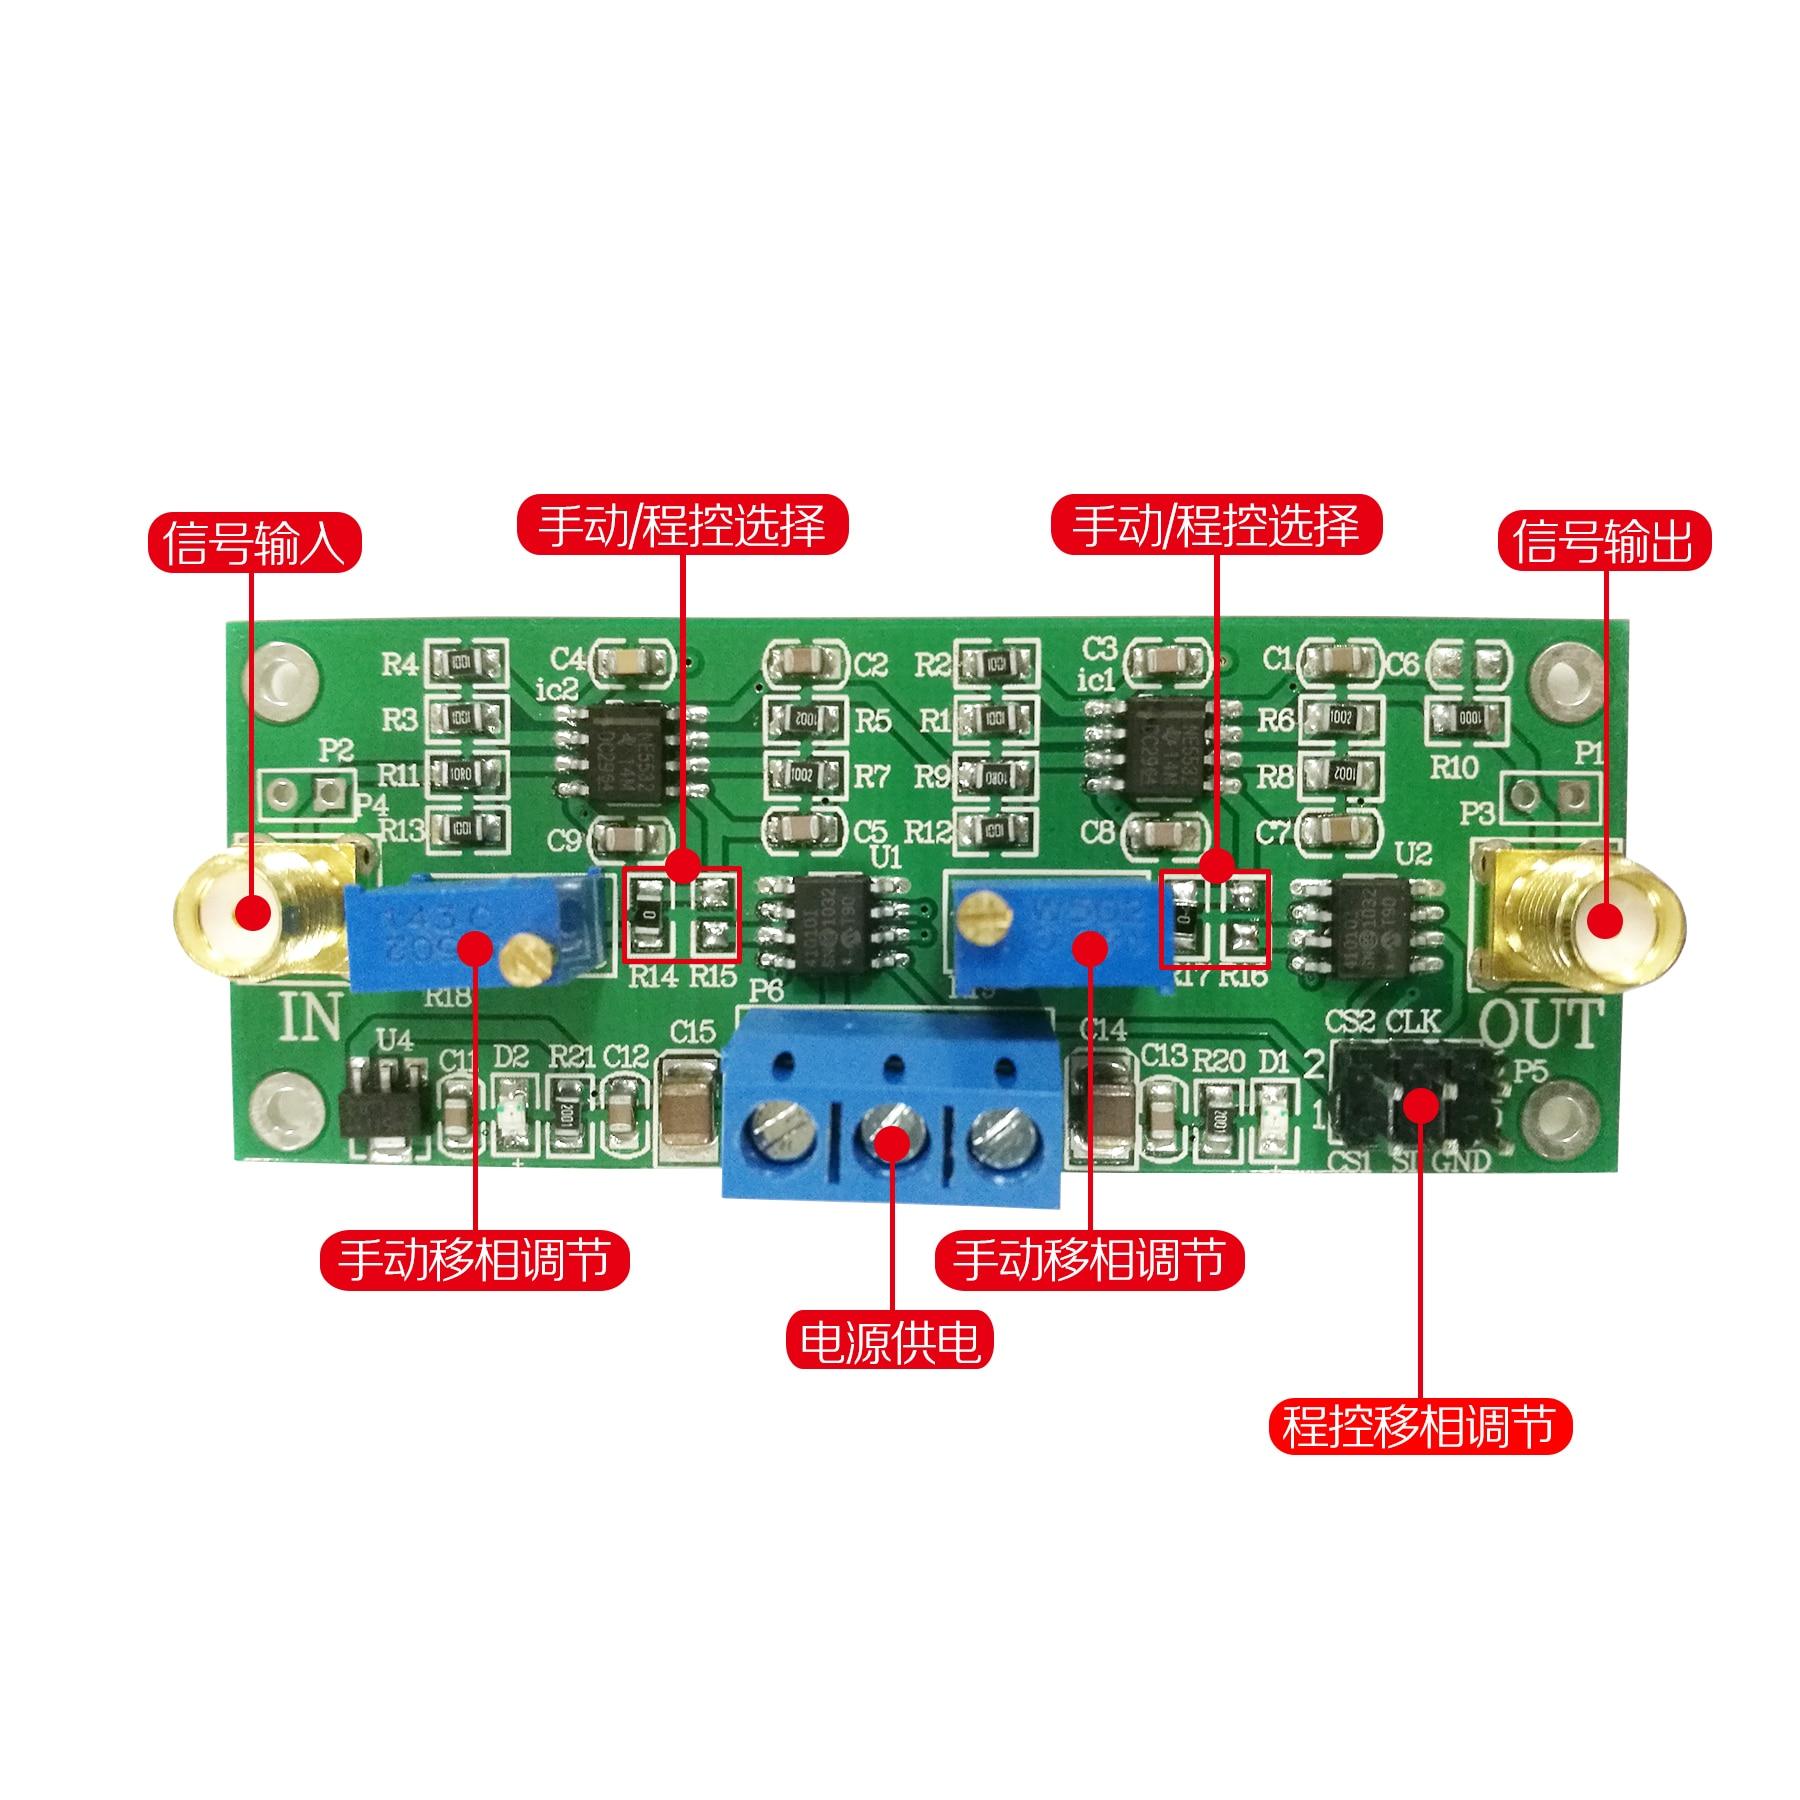 Precision Programmable Phase Shift Amplifier 0-360 Degree Adjustable MCP41010 Adjustable Phase Shifter Circuit Module Board